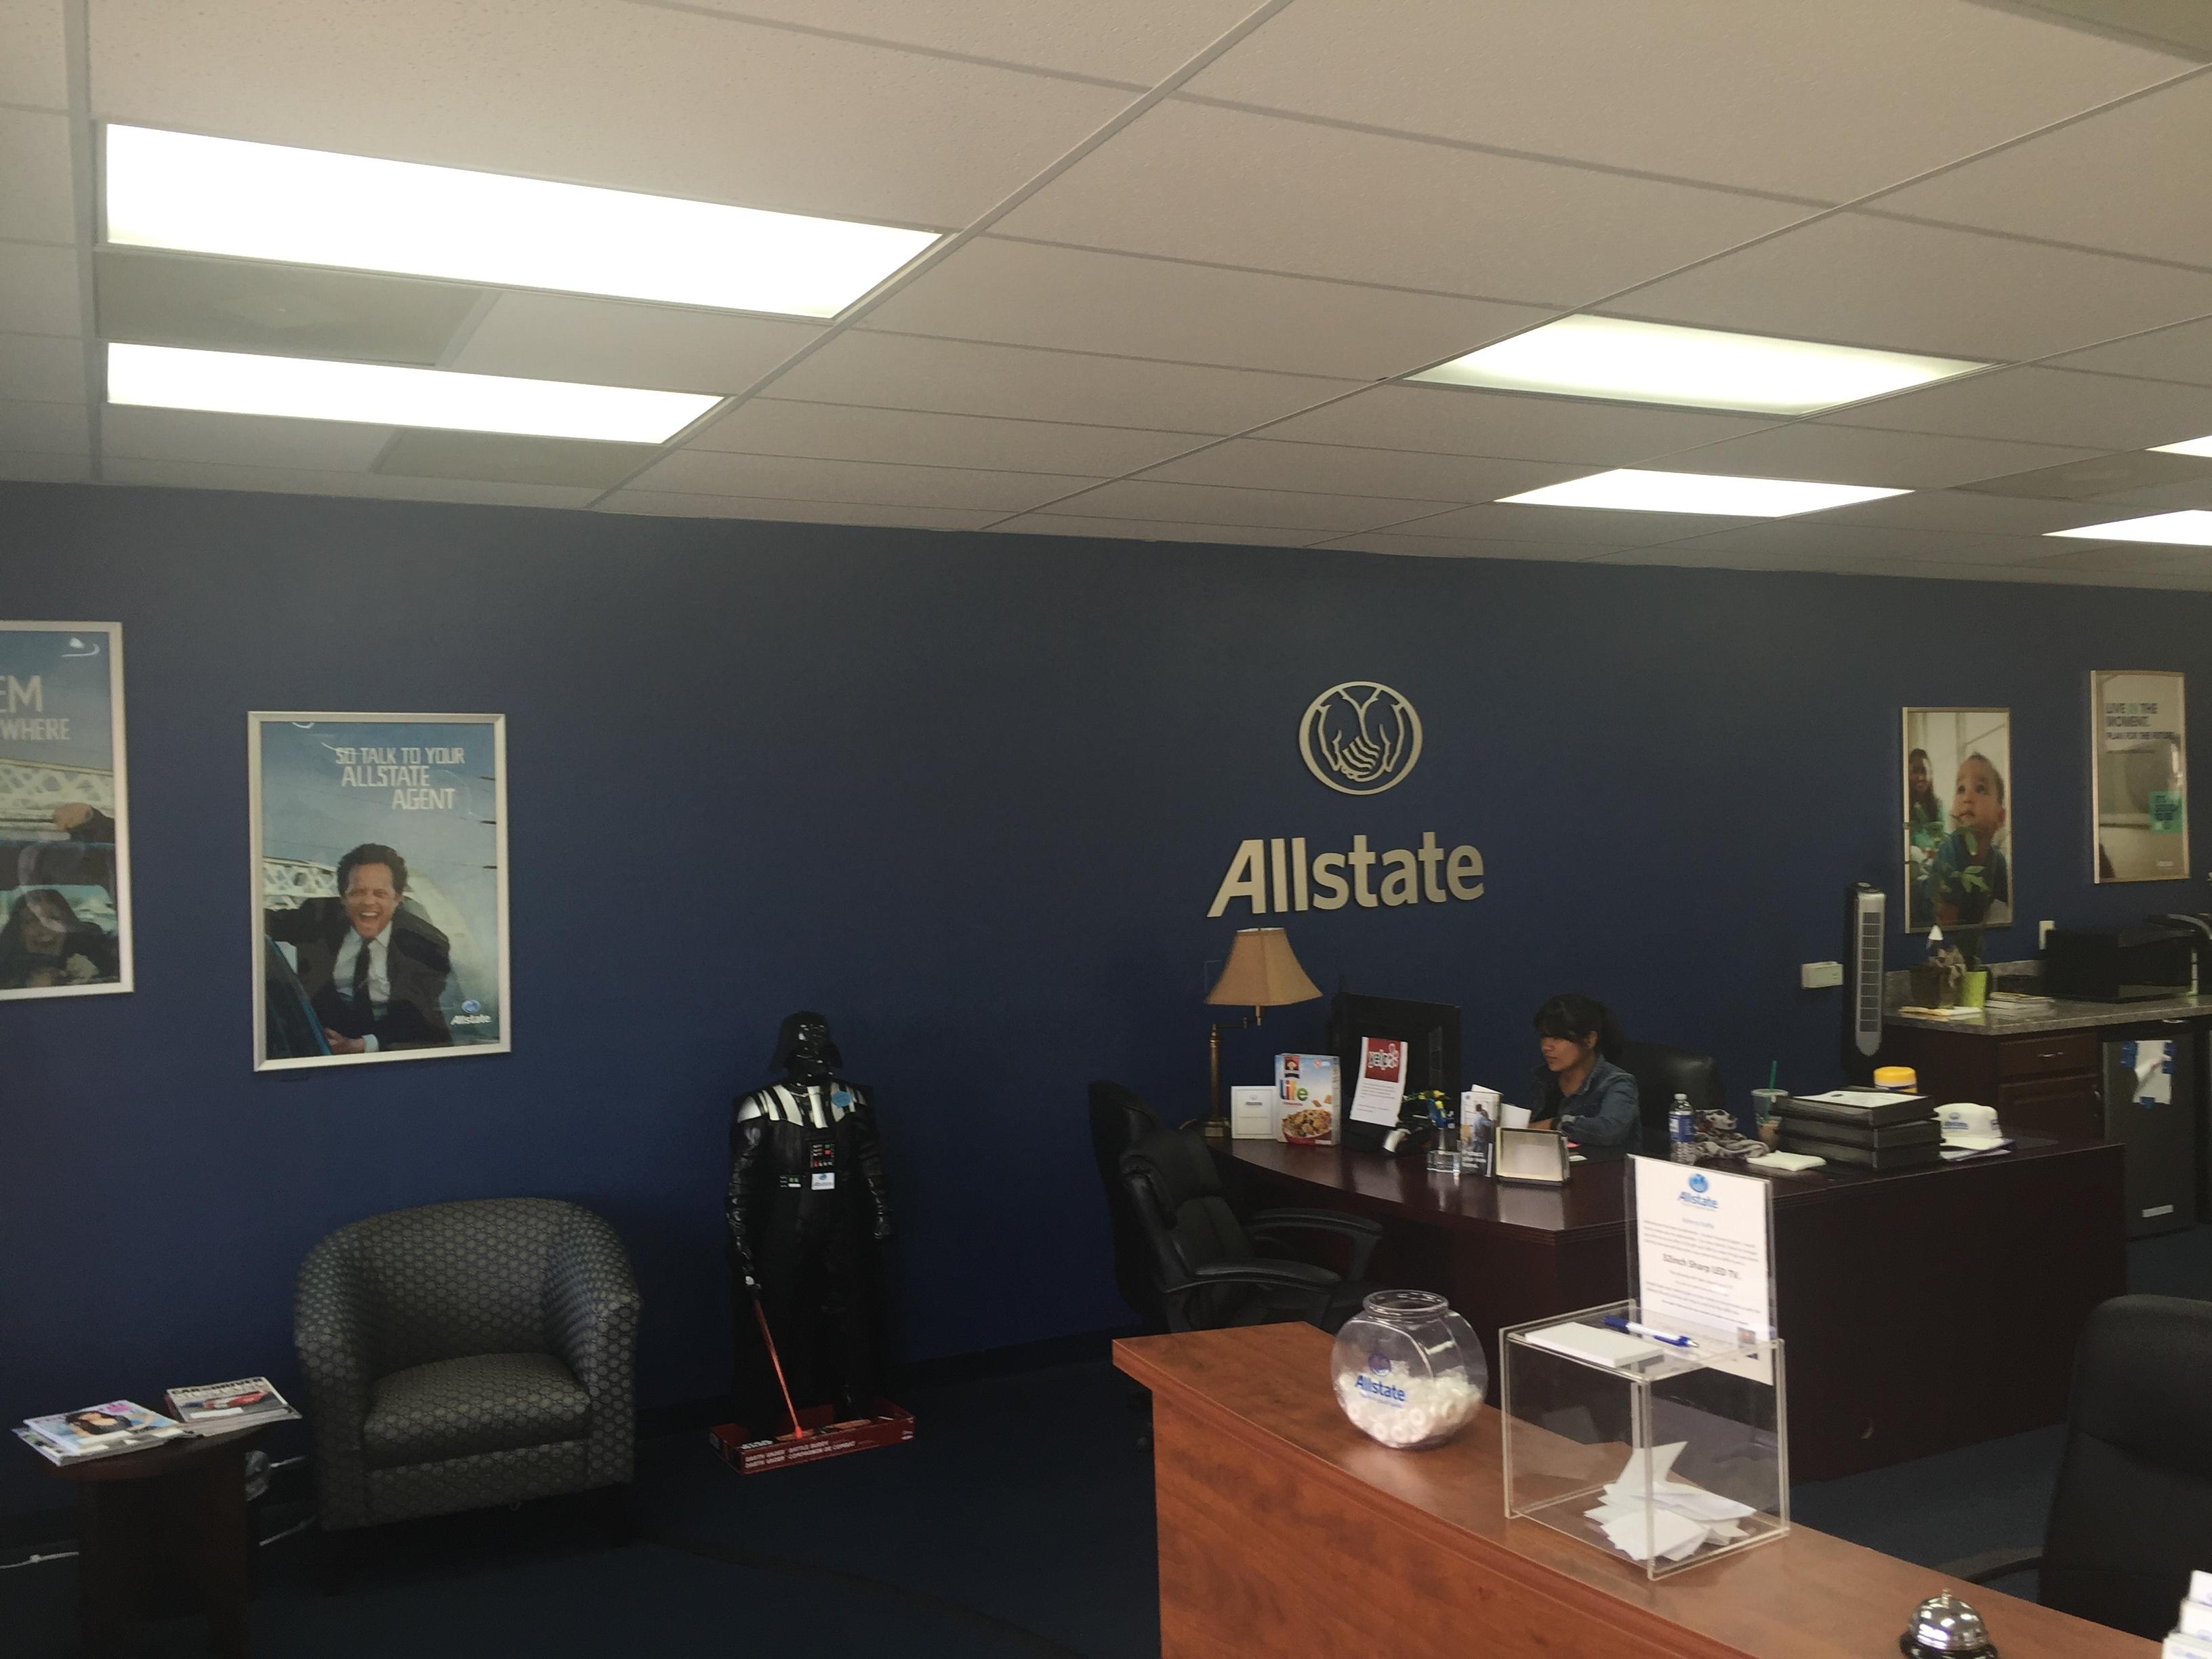 Cheap Car Insurance For Teens >> Allstate | Car Insurance in San Fernando, CA - Paul Losino